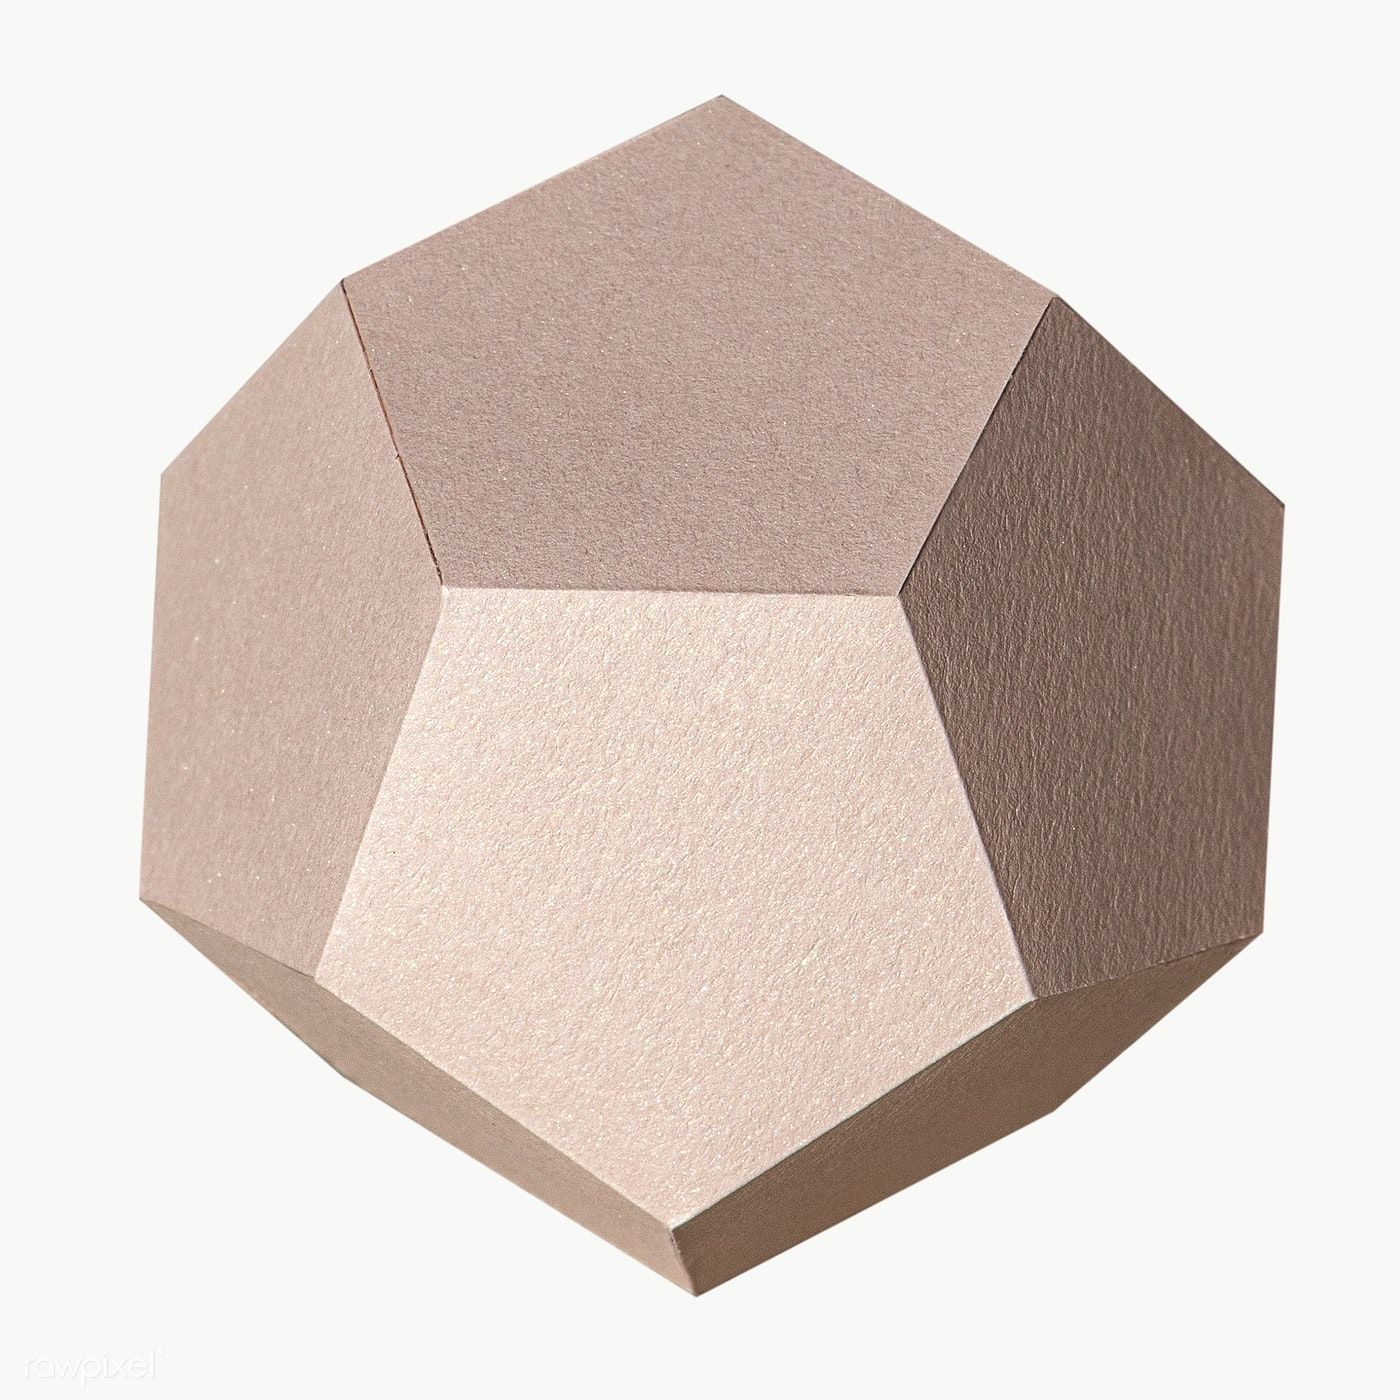 3d Pink Pentagon Shaped Paper Craft Design Element Free Image By Rawpixel Com Jira Pentagon Shape Geometric Shapes Geometric Pattern